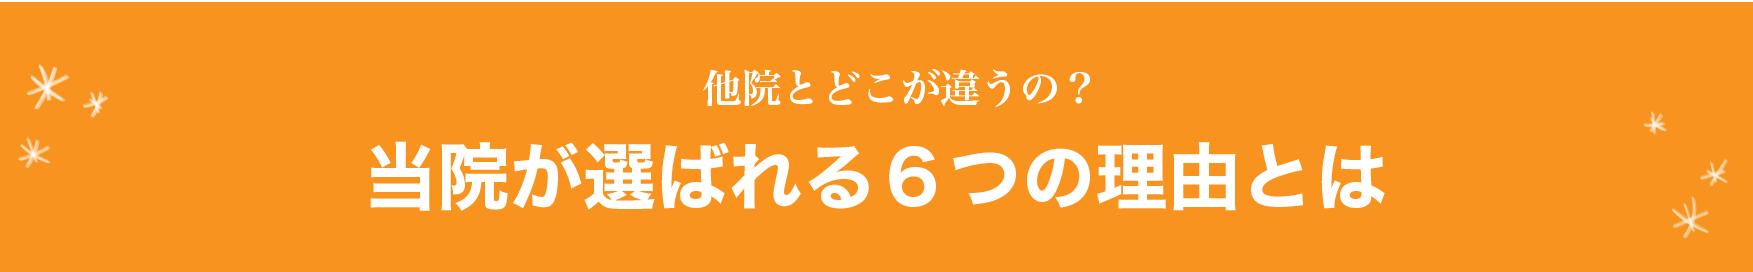 sozai 14 - 当施設紹介